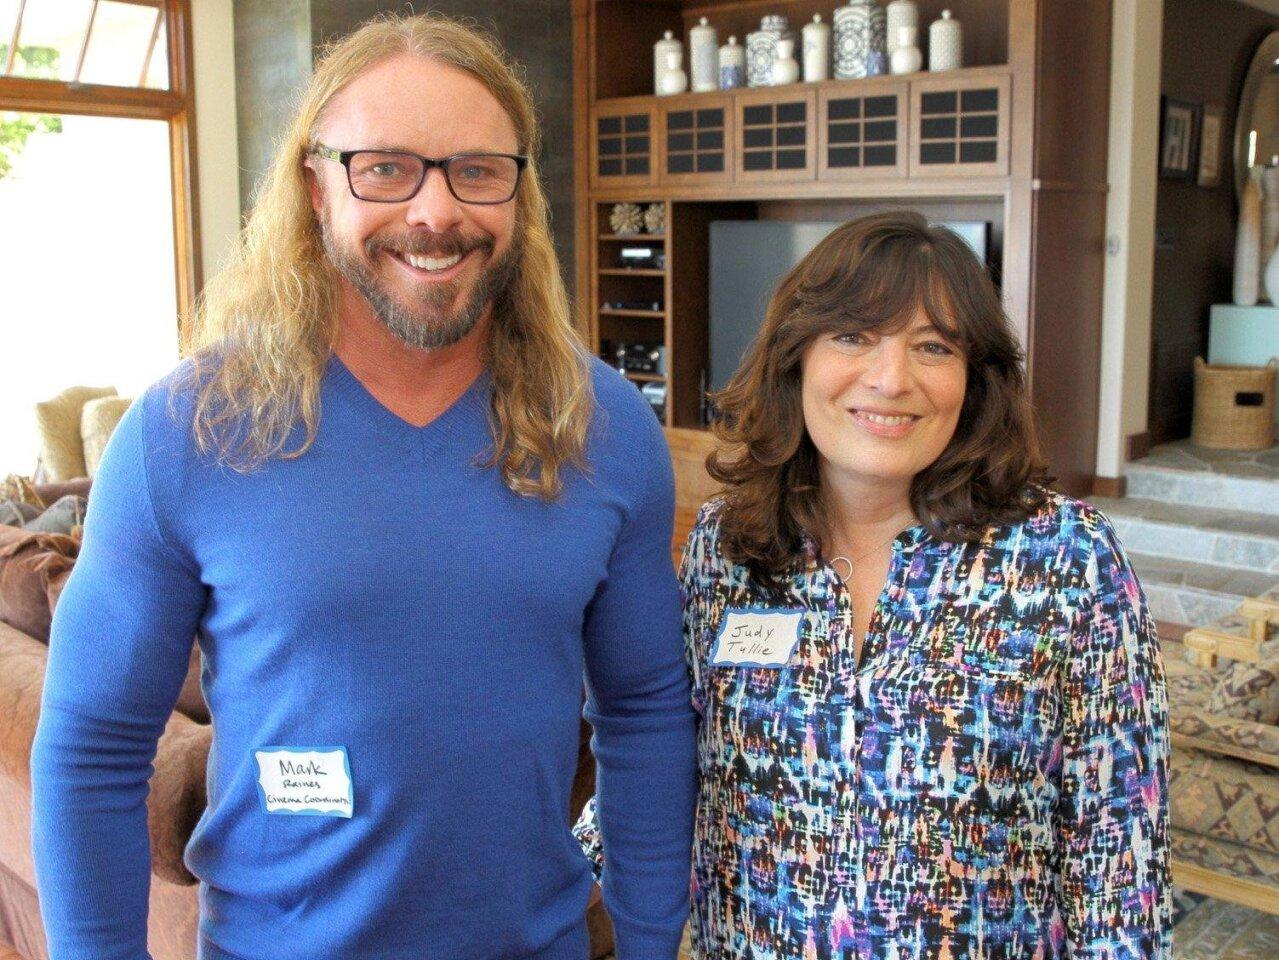 CA Cinema Coordinator Mark Raines with event host Judy Tullie